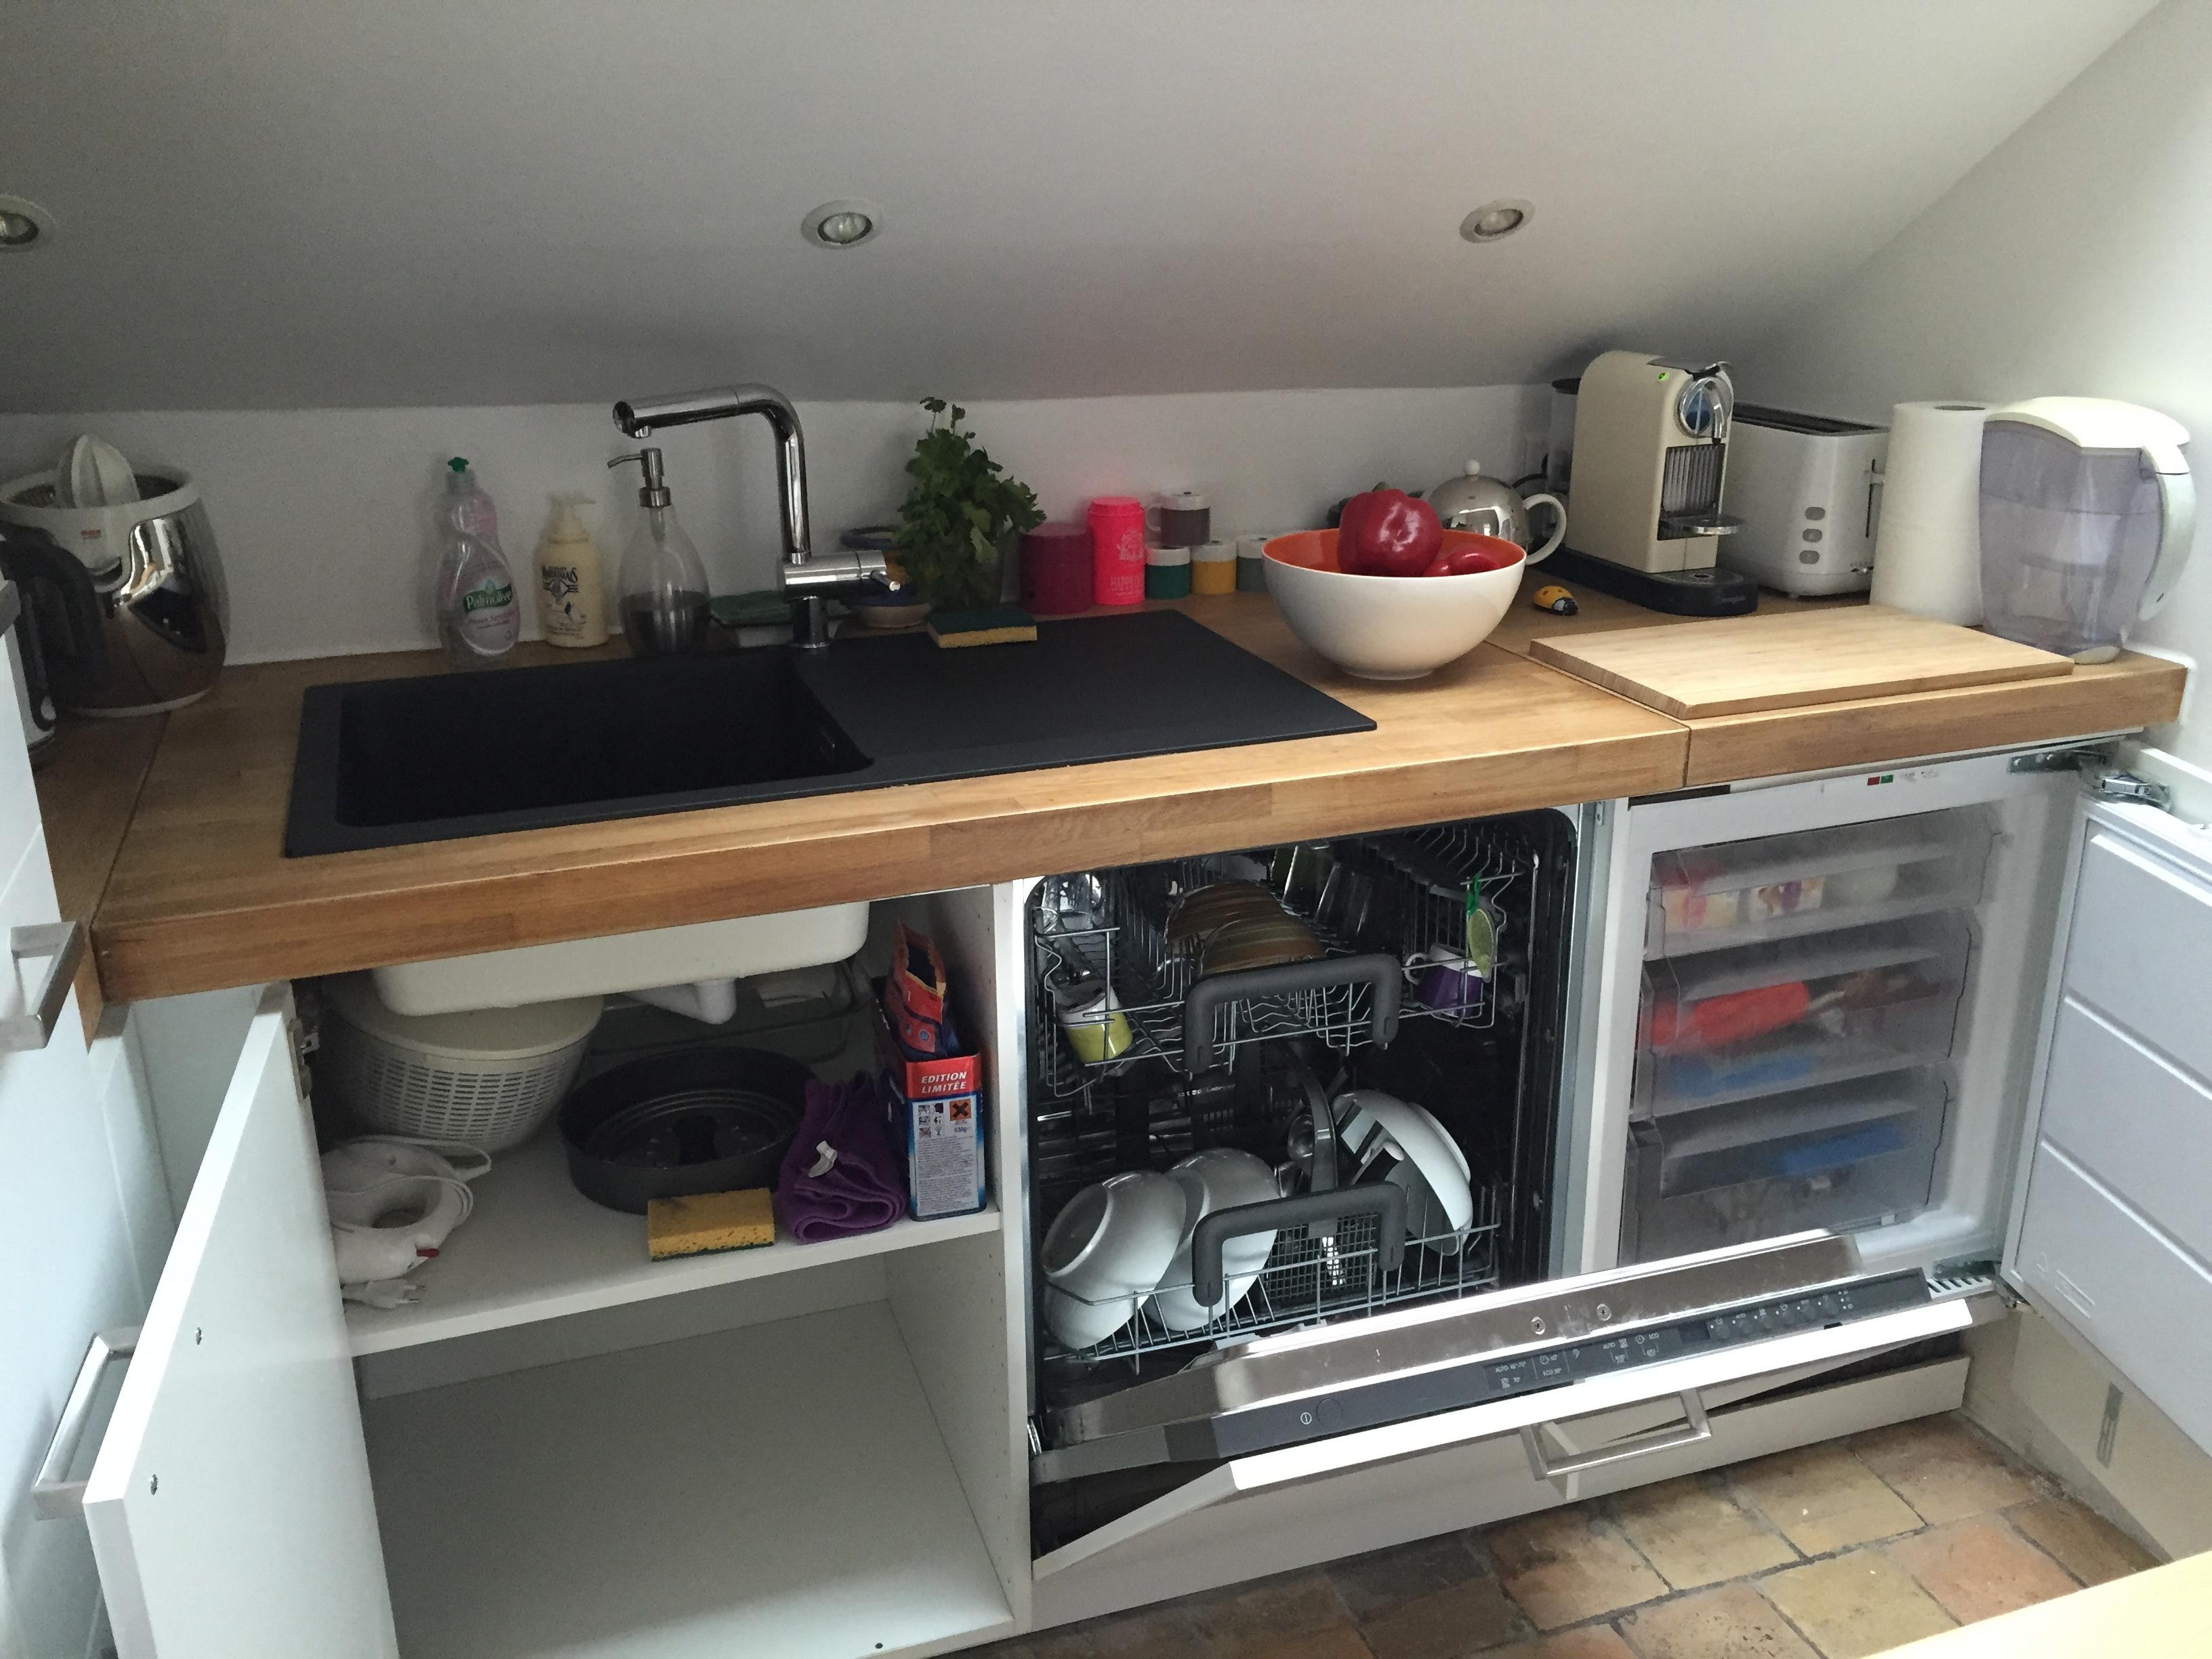 Installateur de cuisine ikea et autres marques - Creation cuisine ikea ...